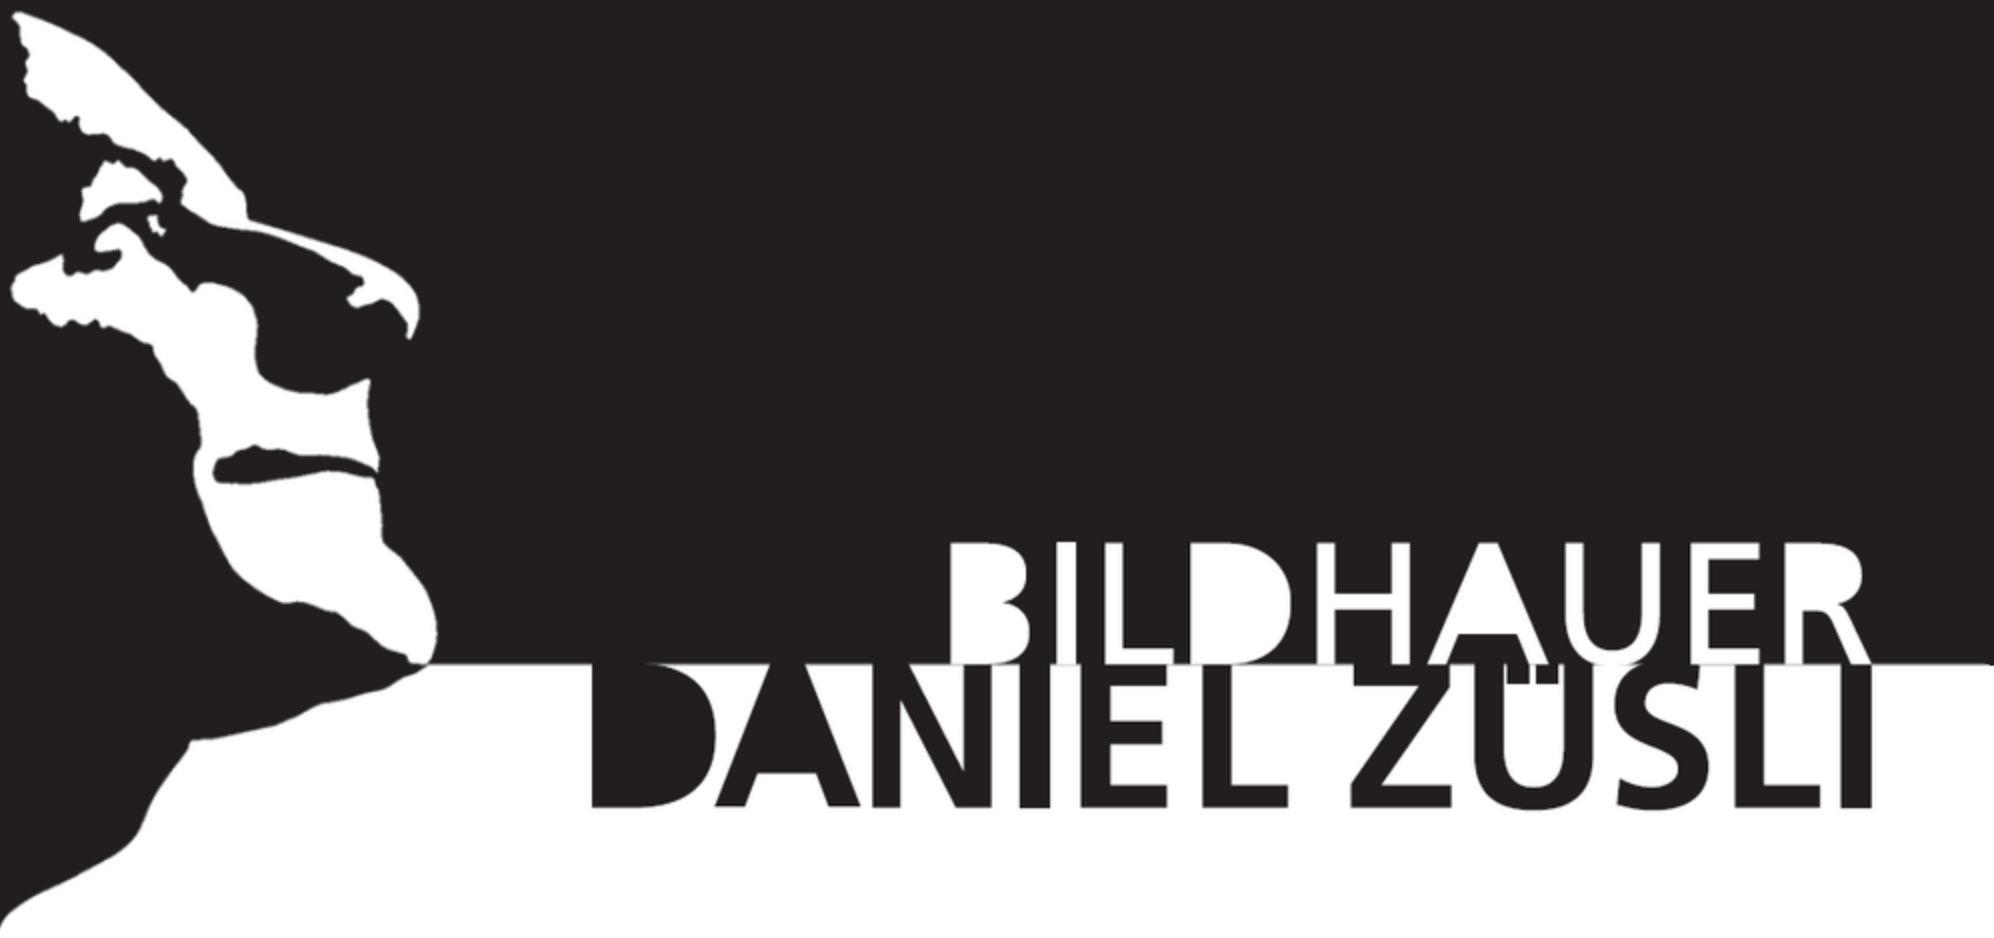 Bildhauer Daniel Züsli Friend